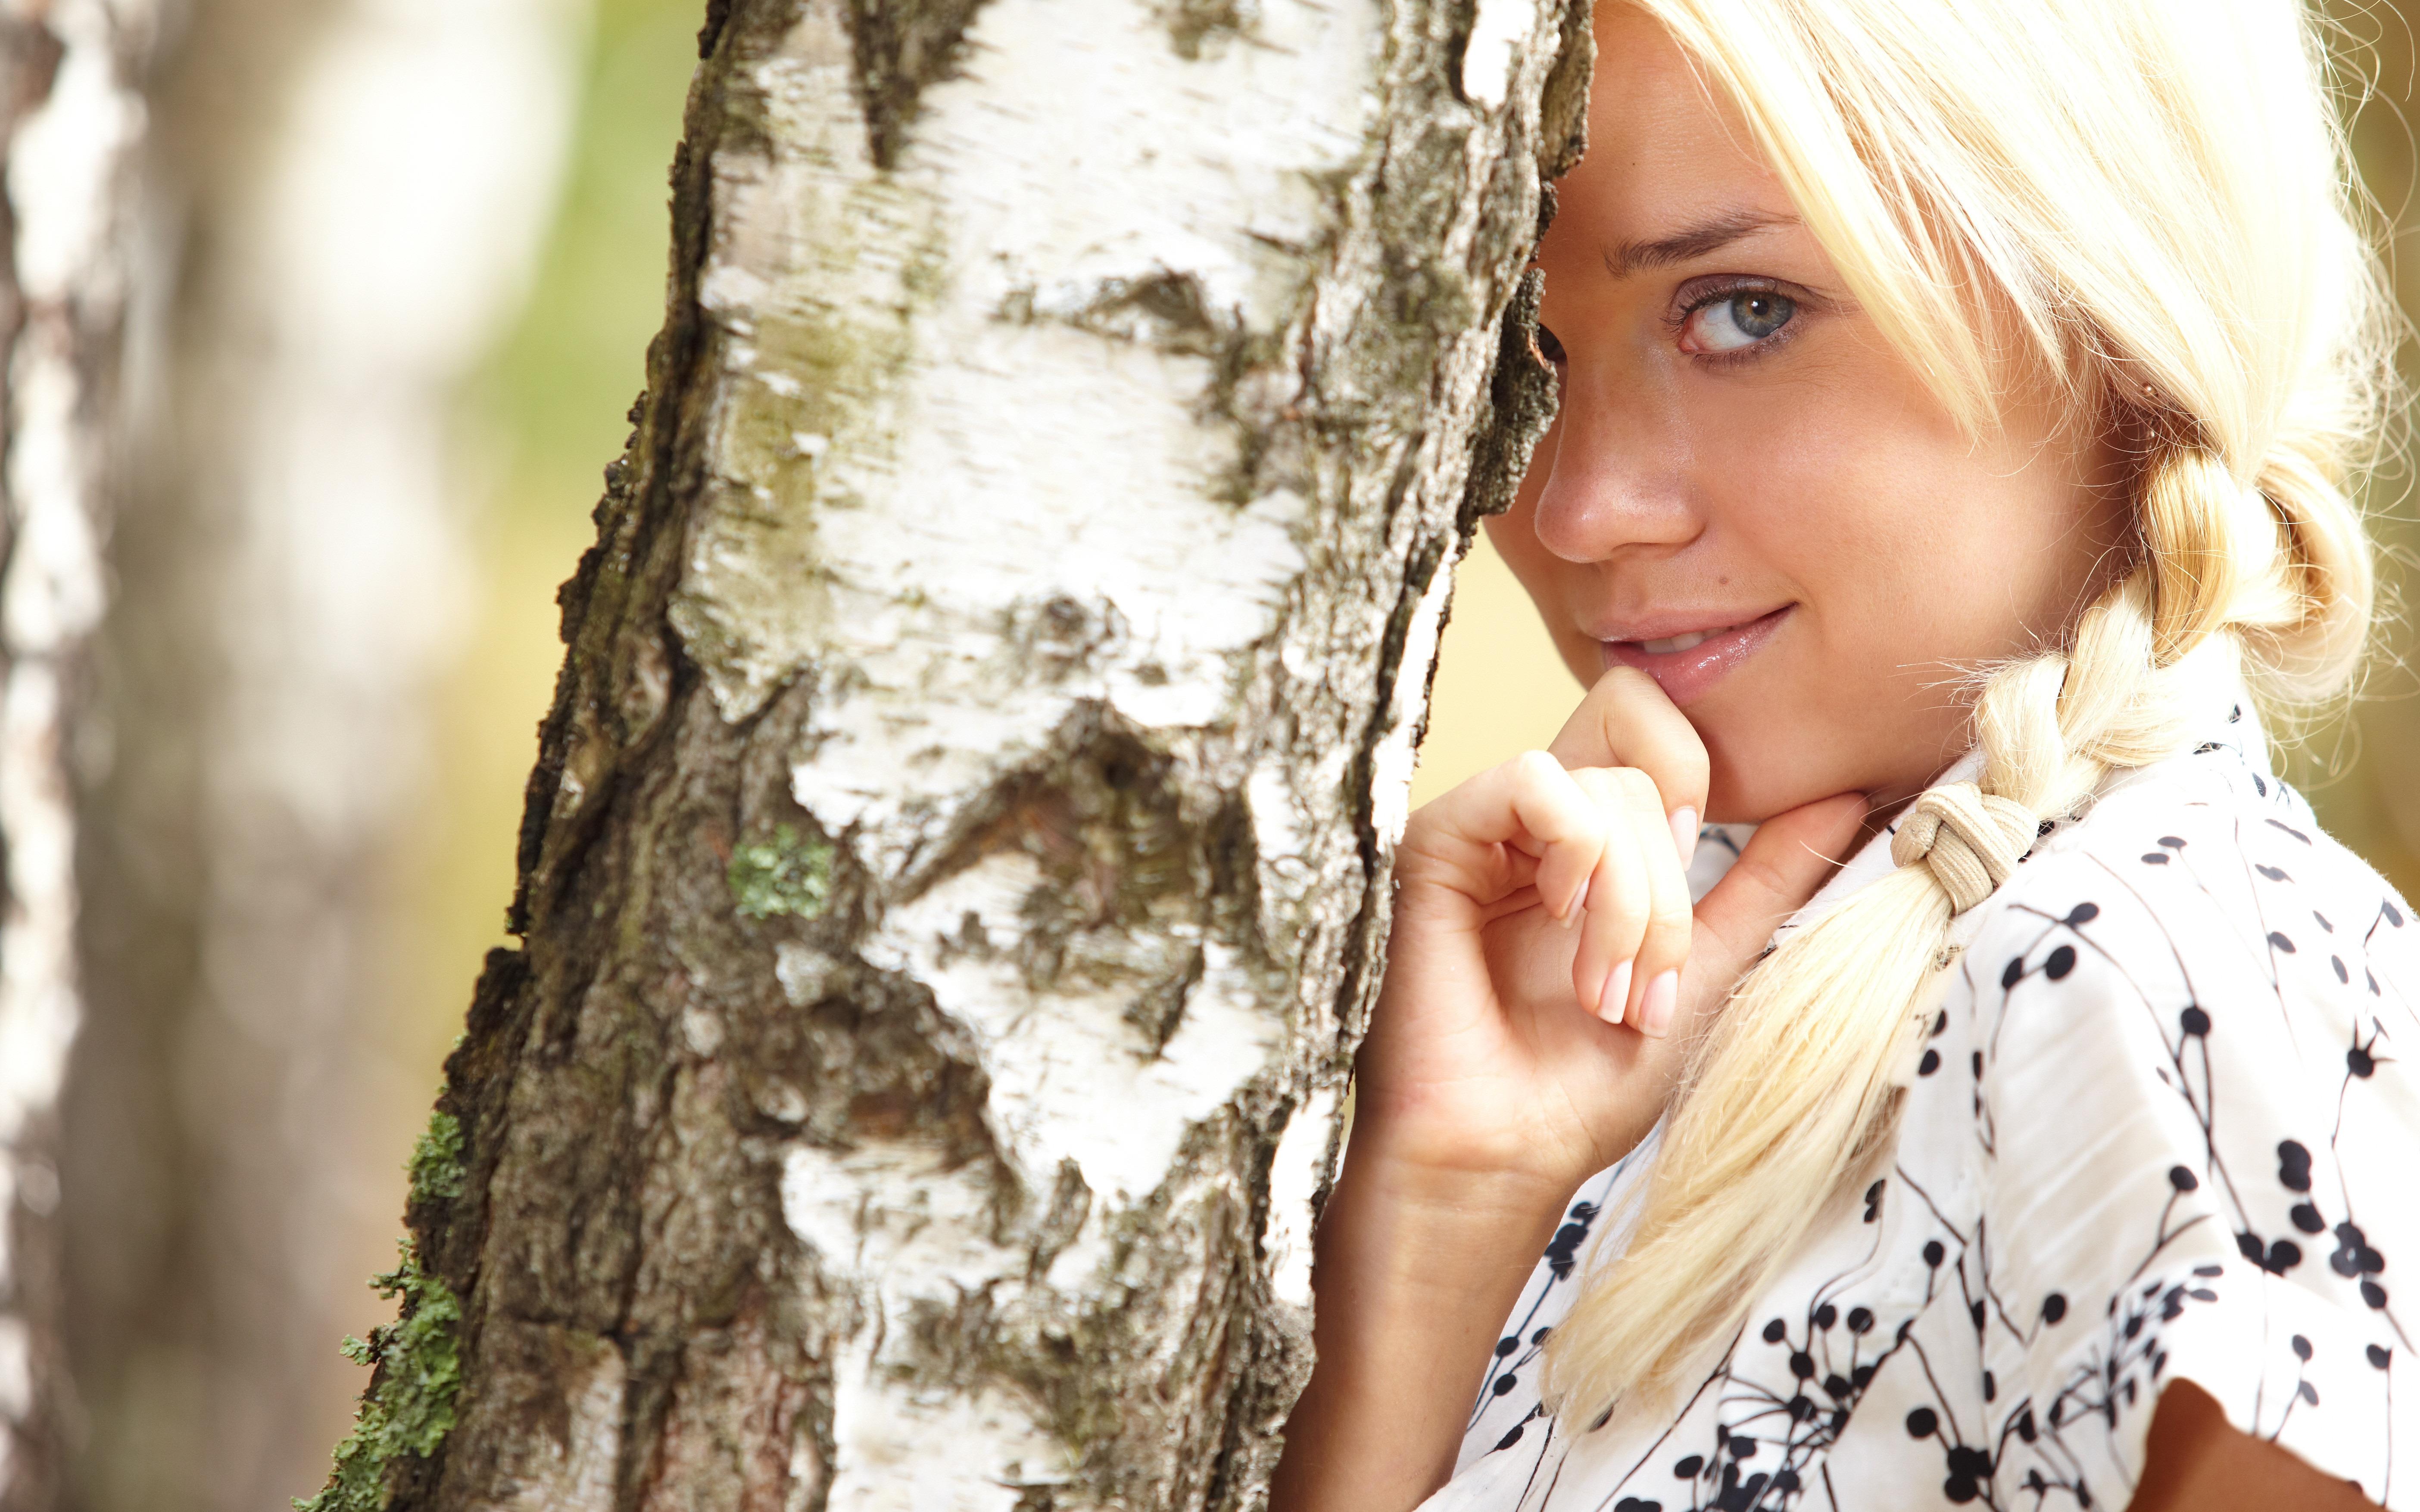 блондинка дерево поле blonde tree field  № 1377093 загрузить